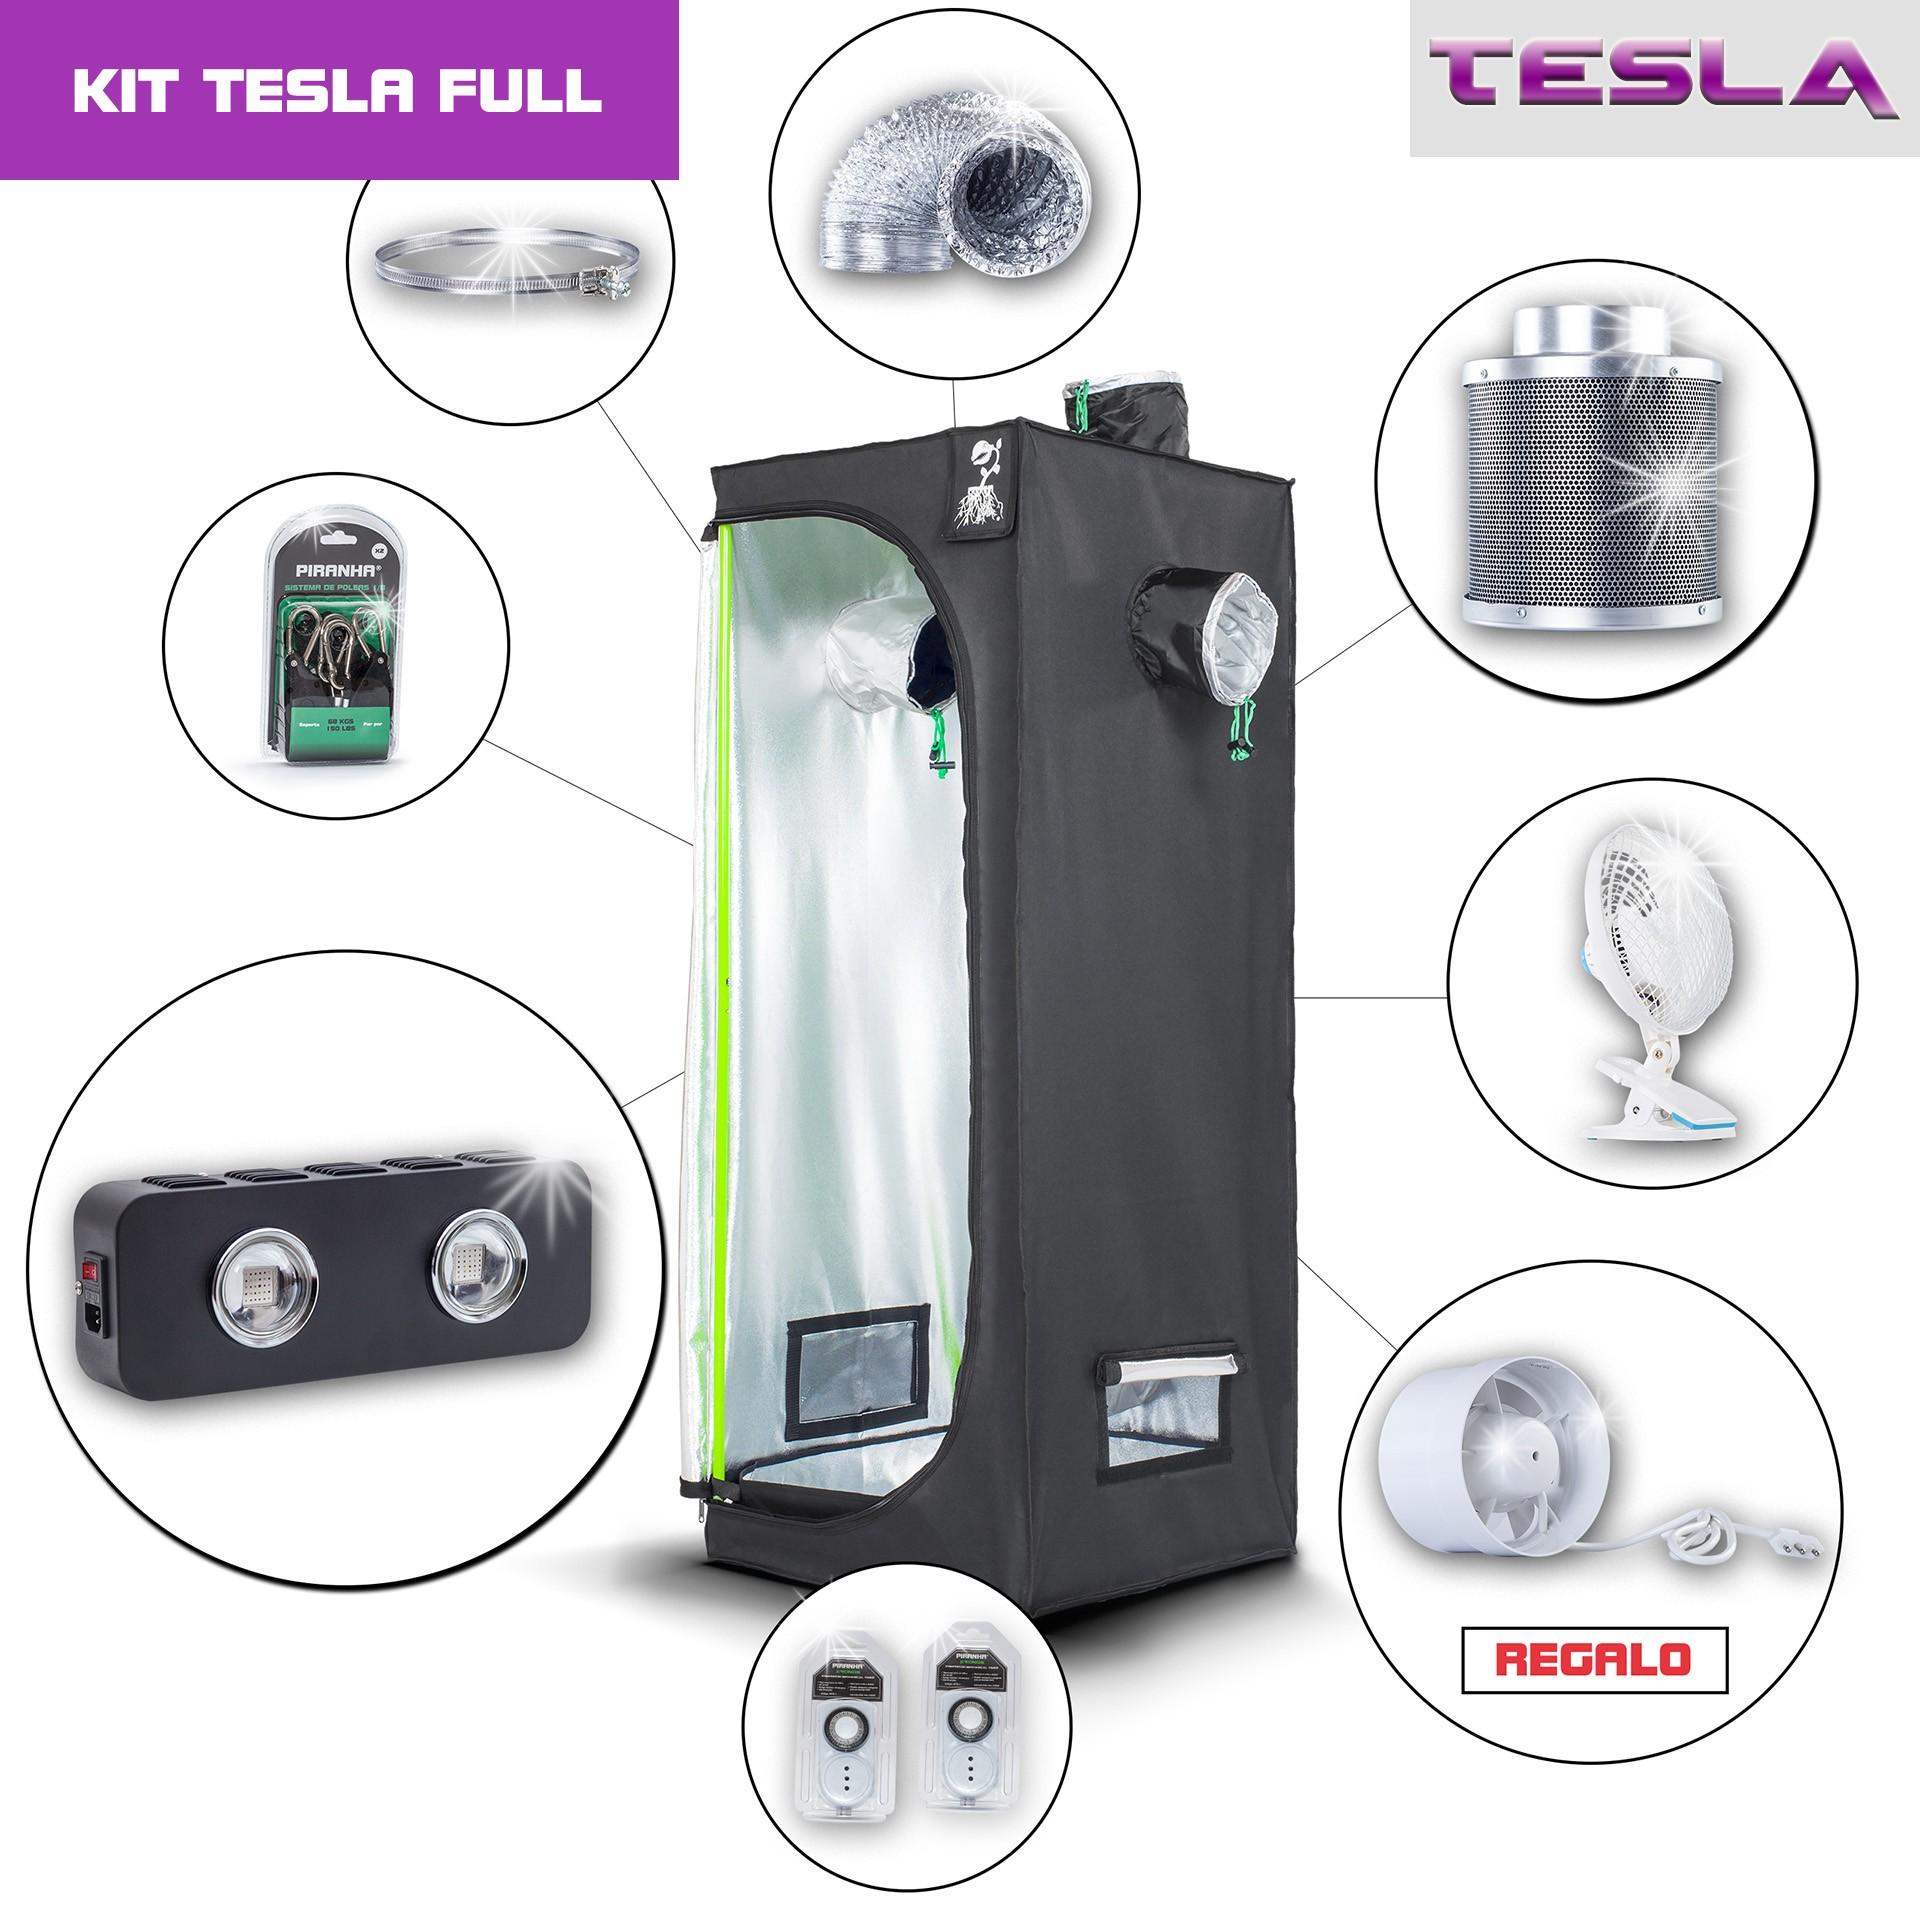 Kit Tesla 80 - T180W Full